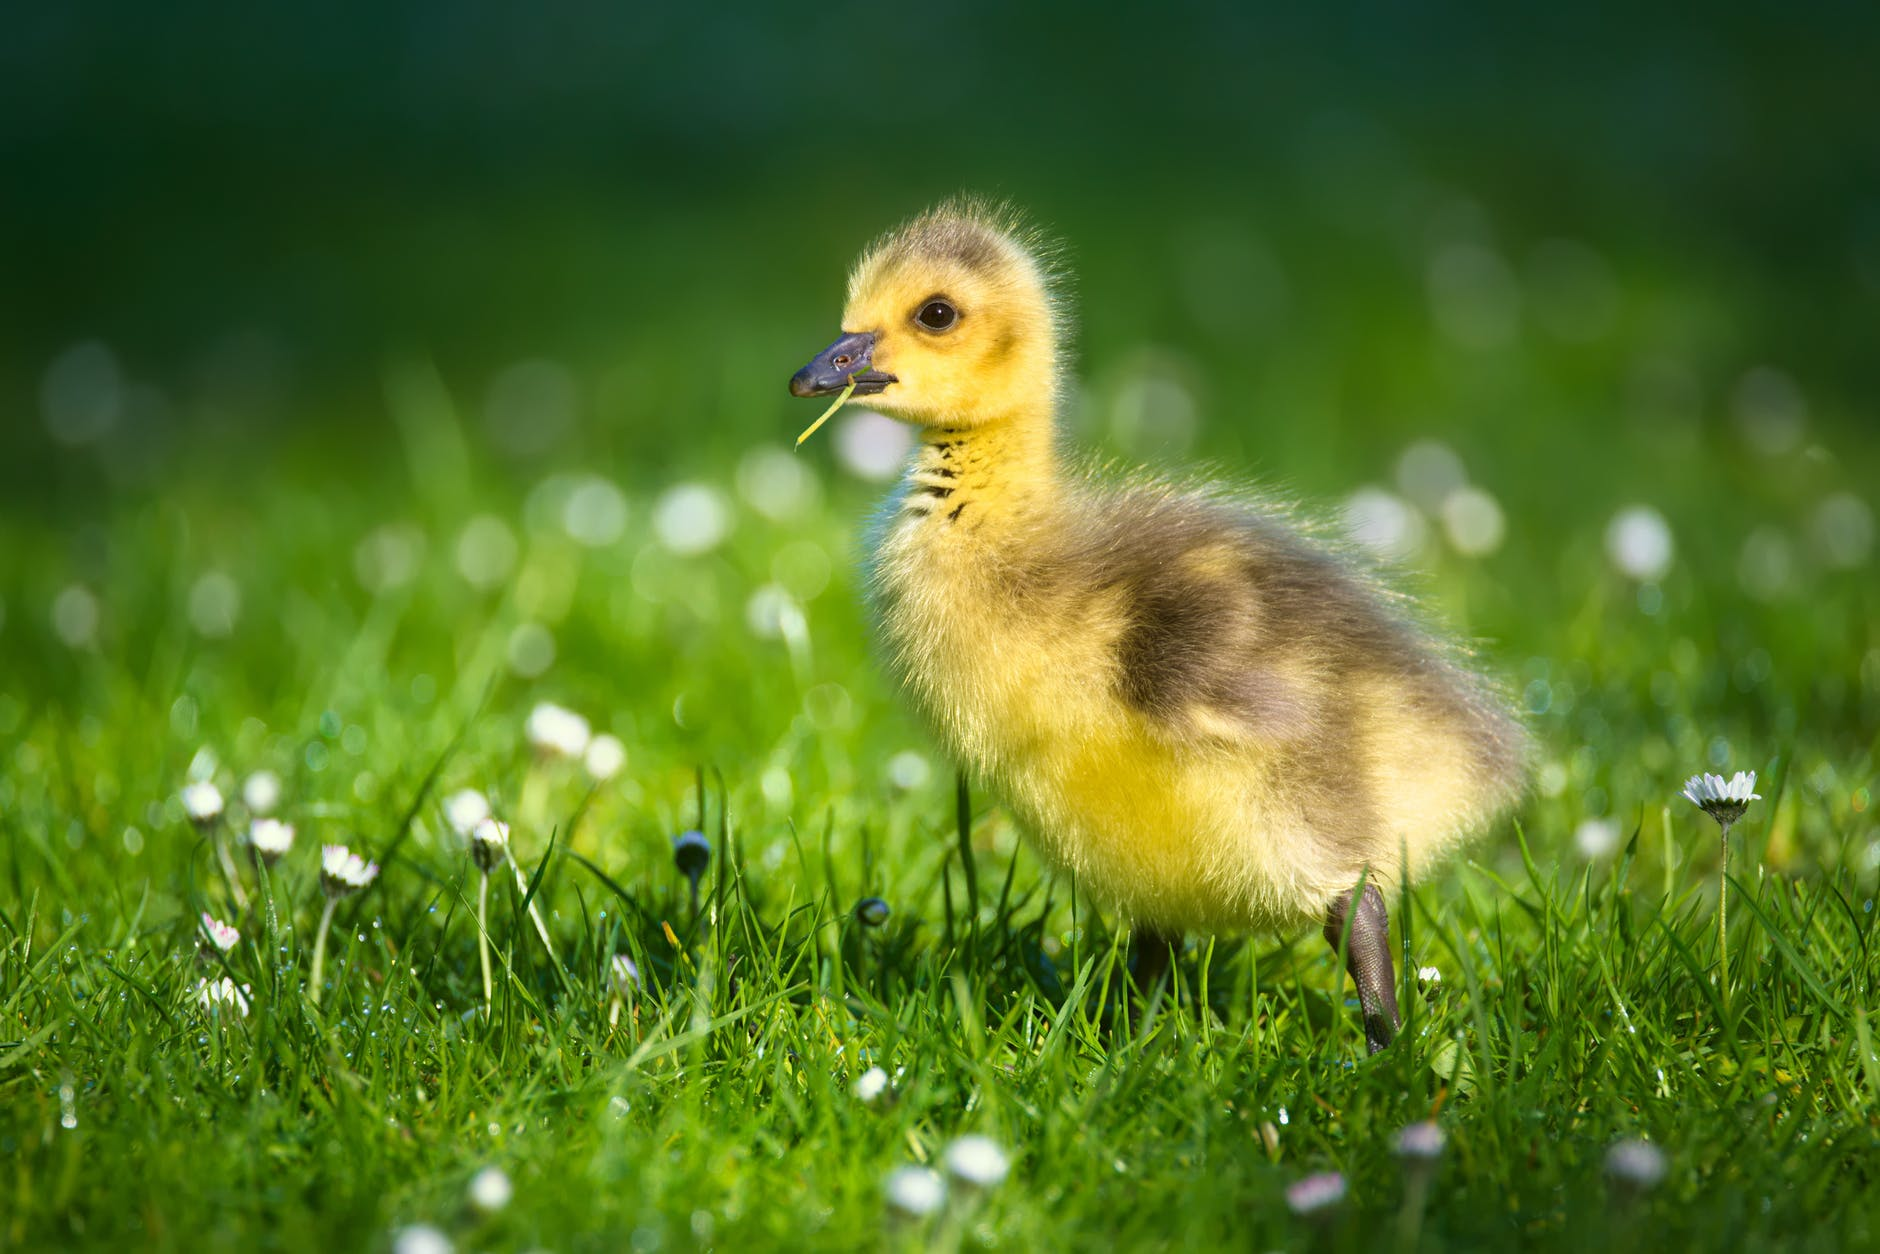 animal animal world close up duckling